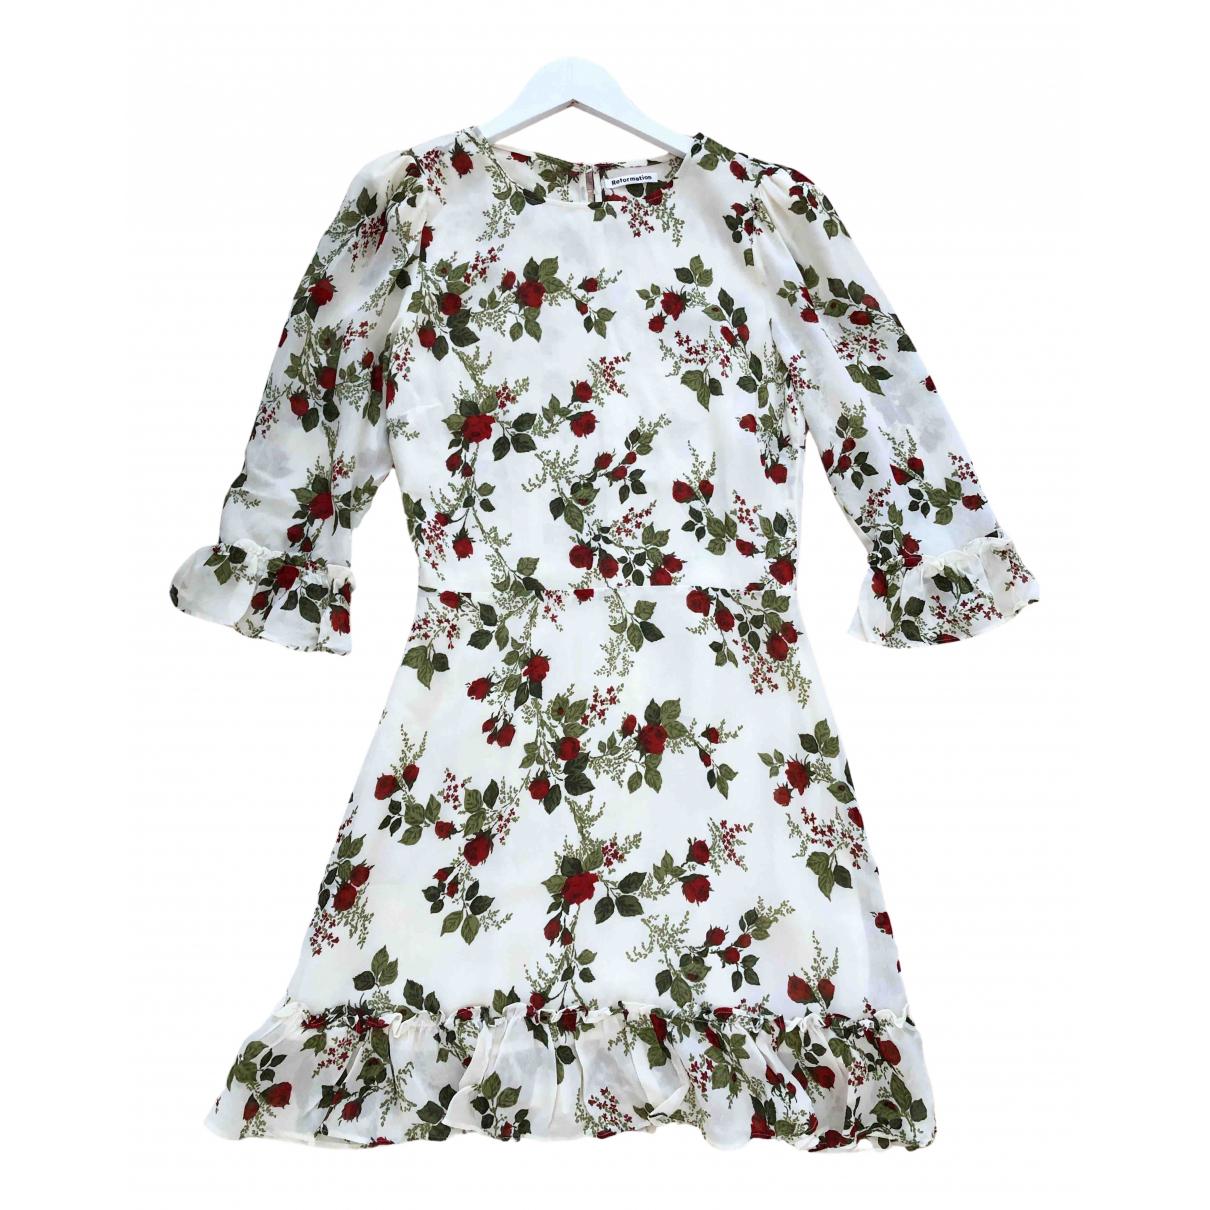 Reformation N Ecru dress for Women 4 US